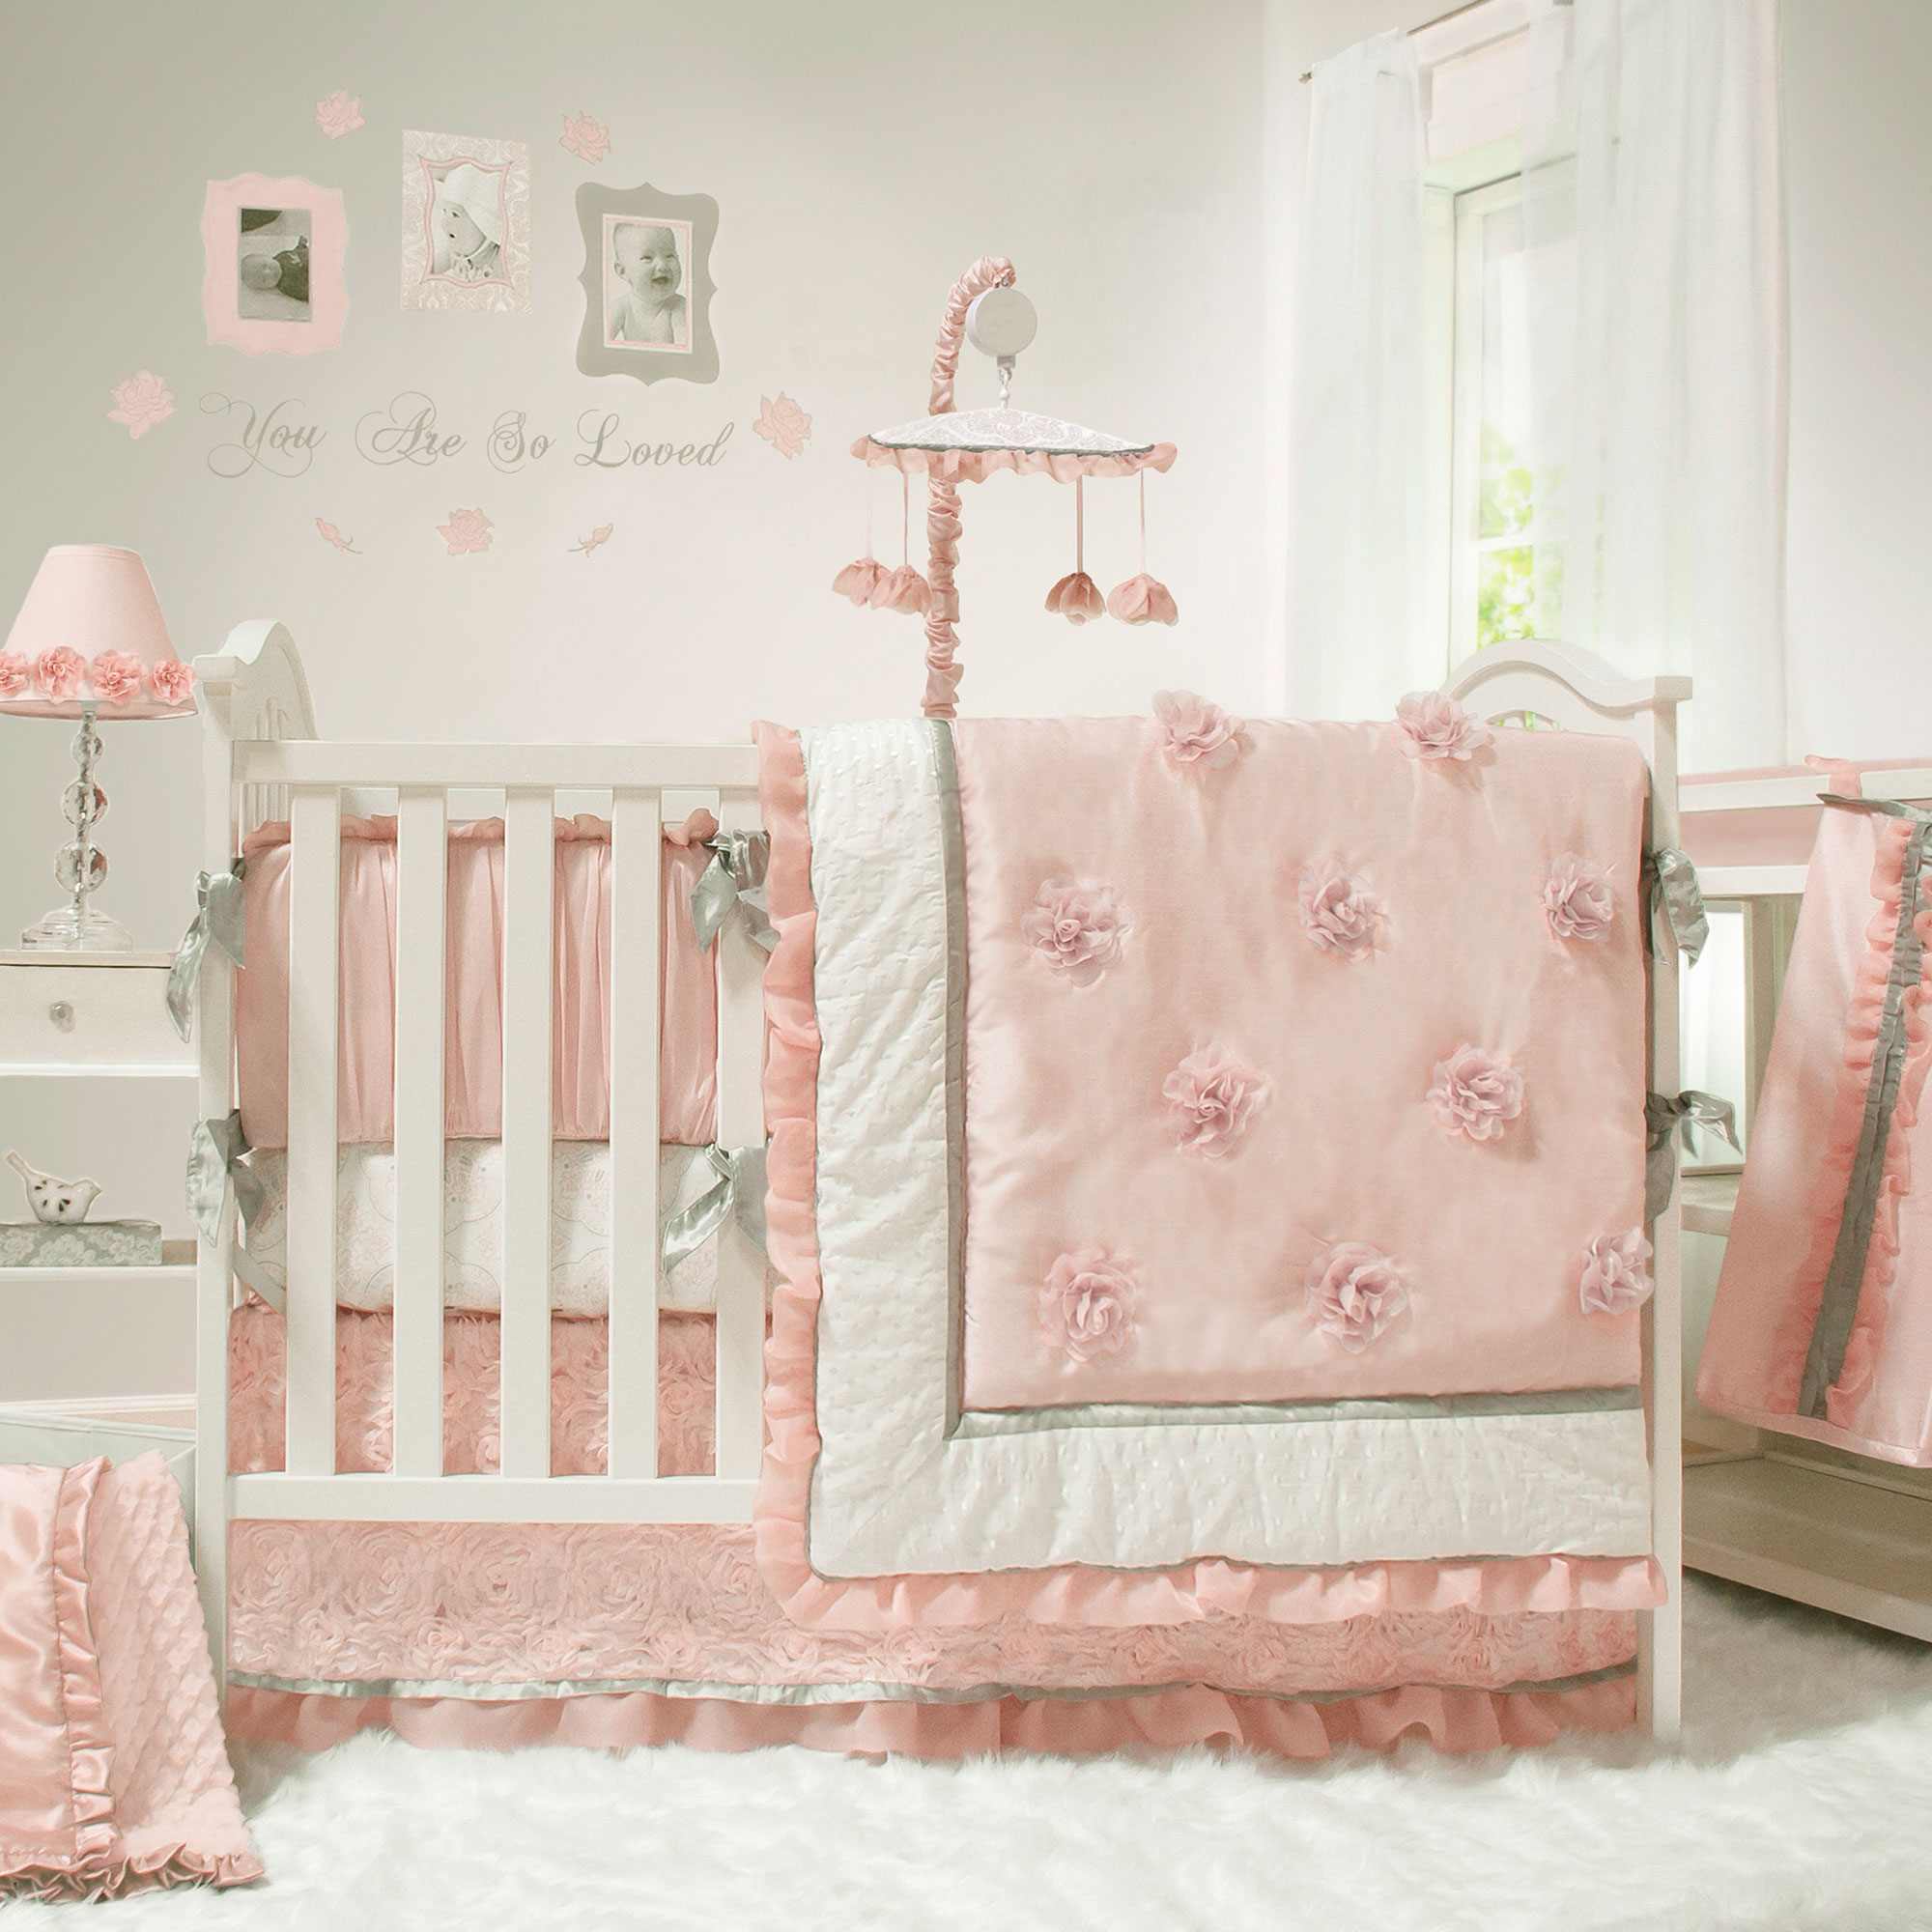 The Peanut Shell Baby Girl <mark>Crib</mark> Bedding Set - Pink and White - Arianna 4 Piece Set